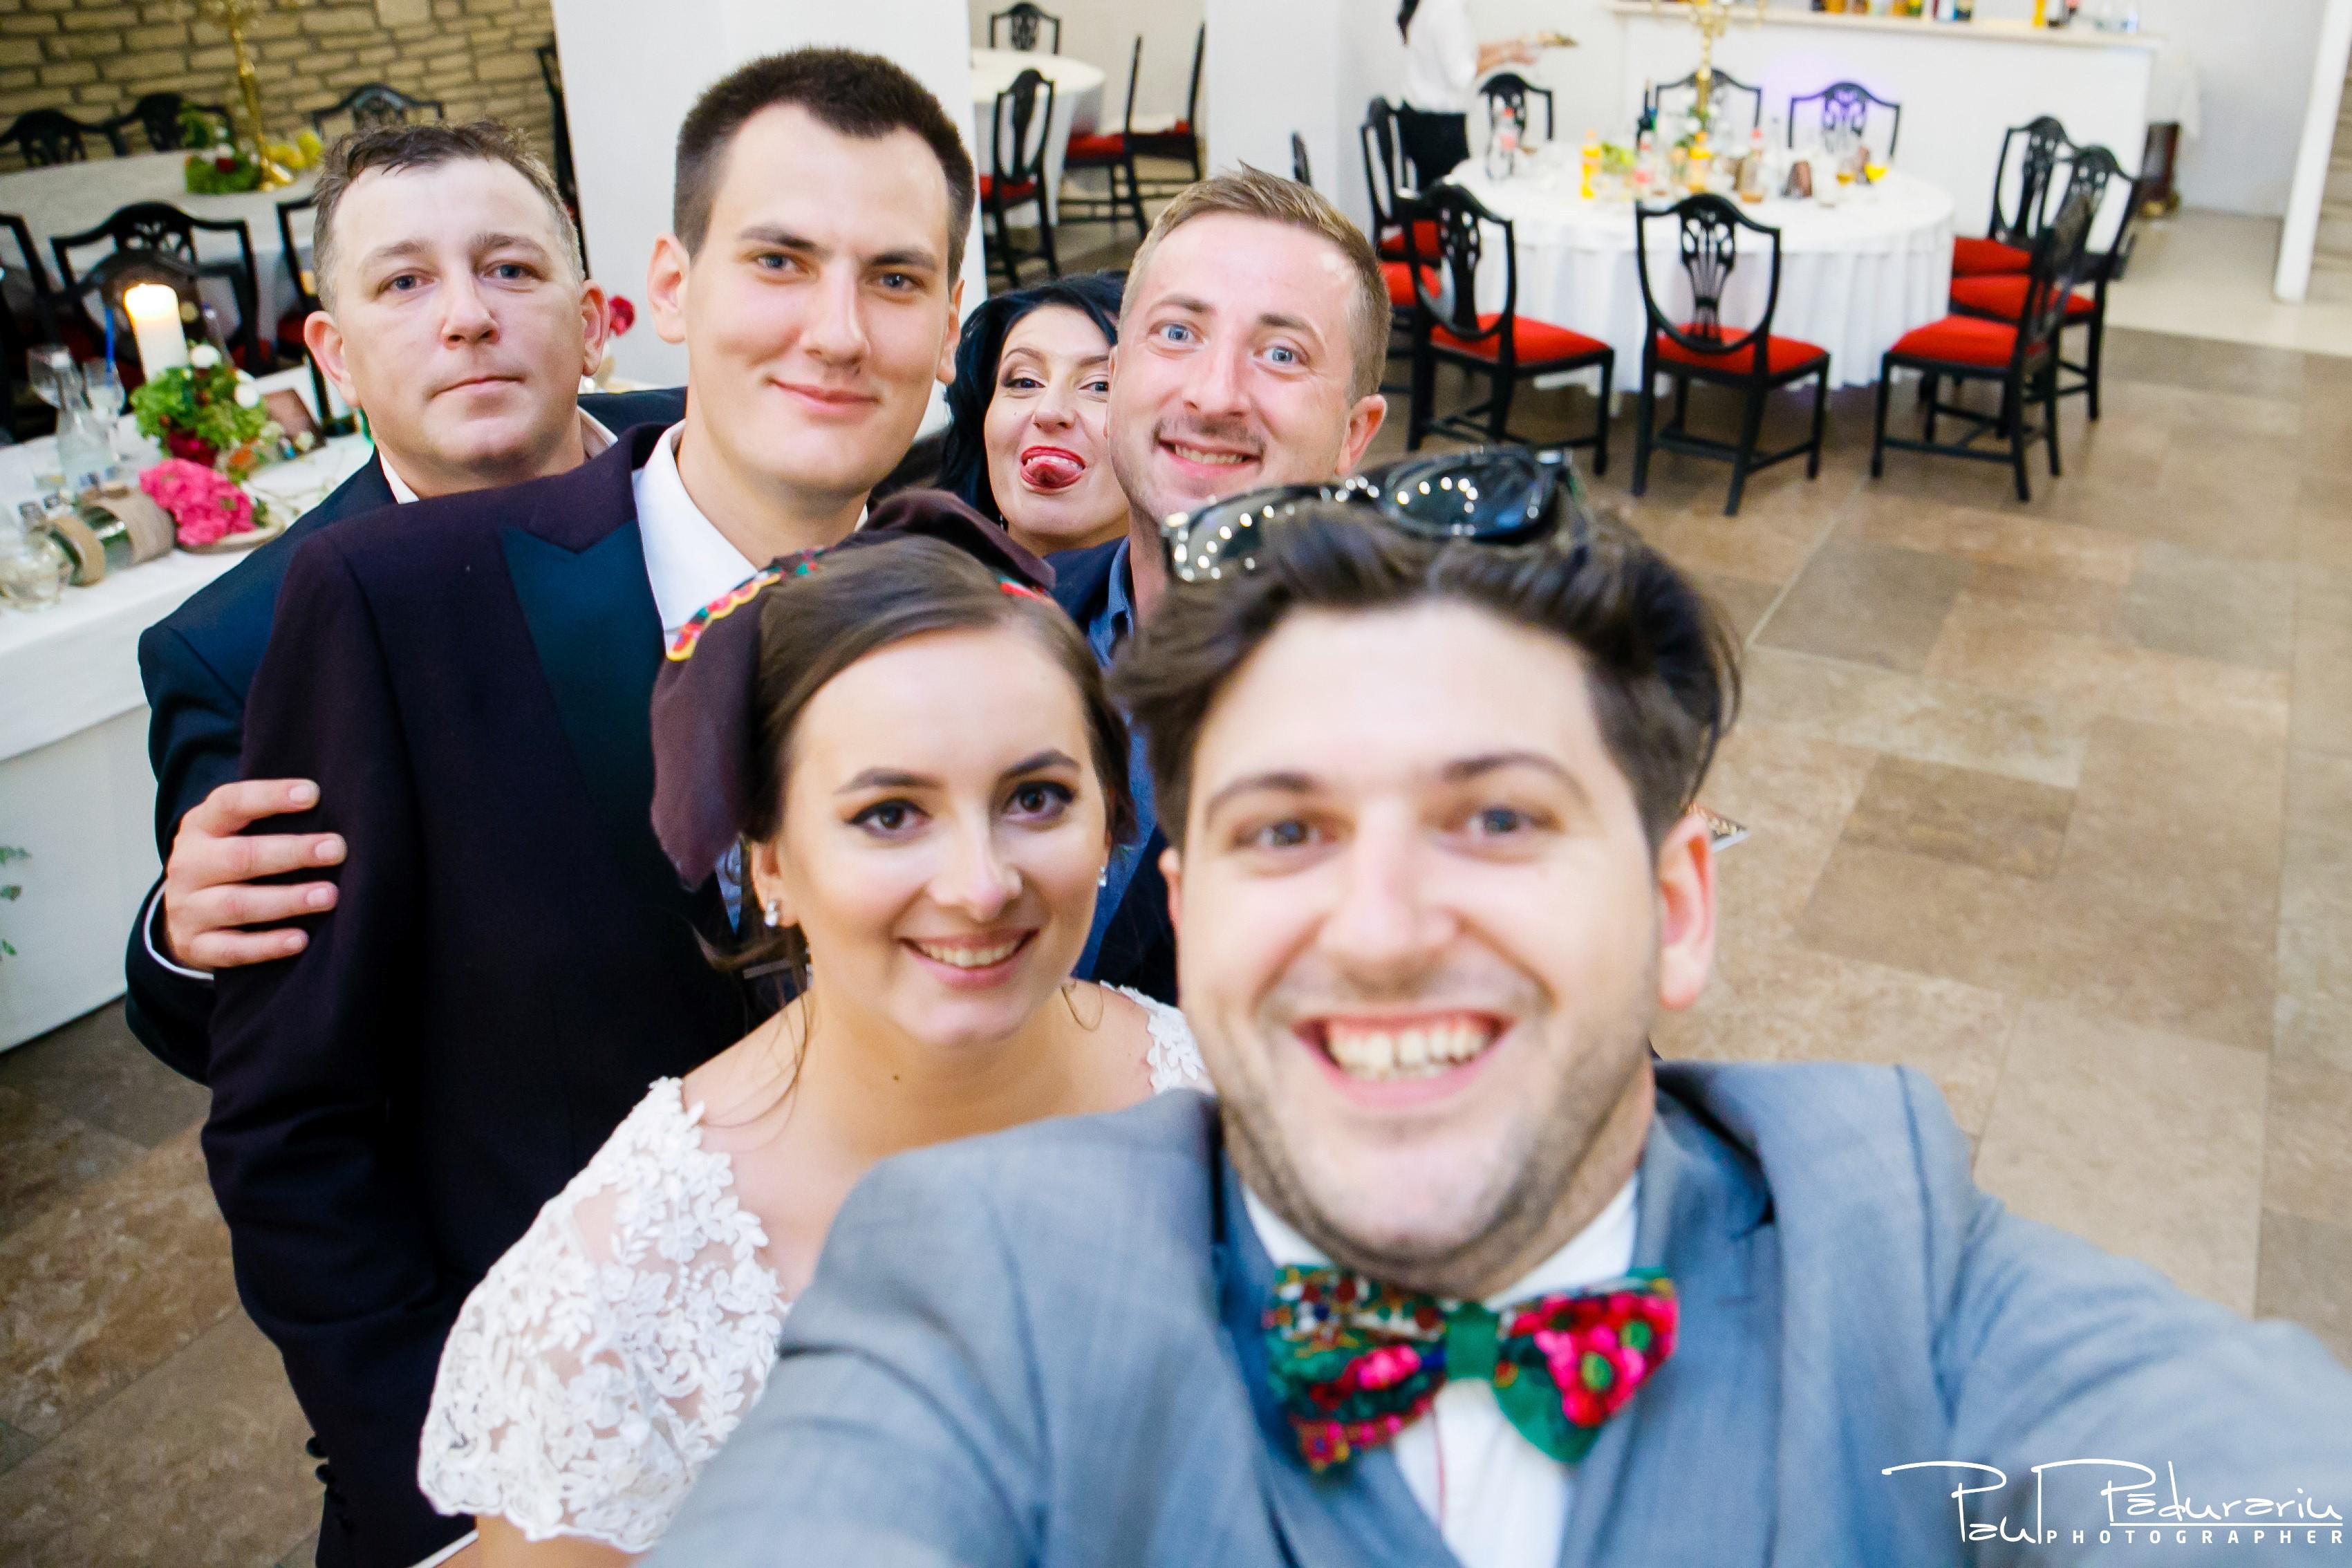 Cristina si Razvan nunta rustica la Bellaria selfie cu mirii fotograf profesionist nunta Iasi www.paulpadurariu.ro © 2017 Paul Padurariu